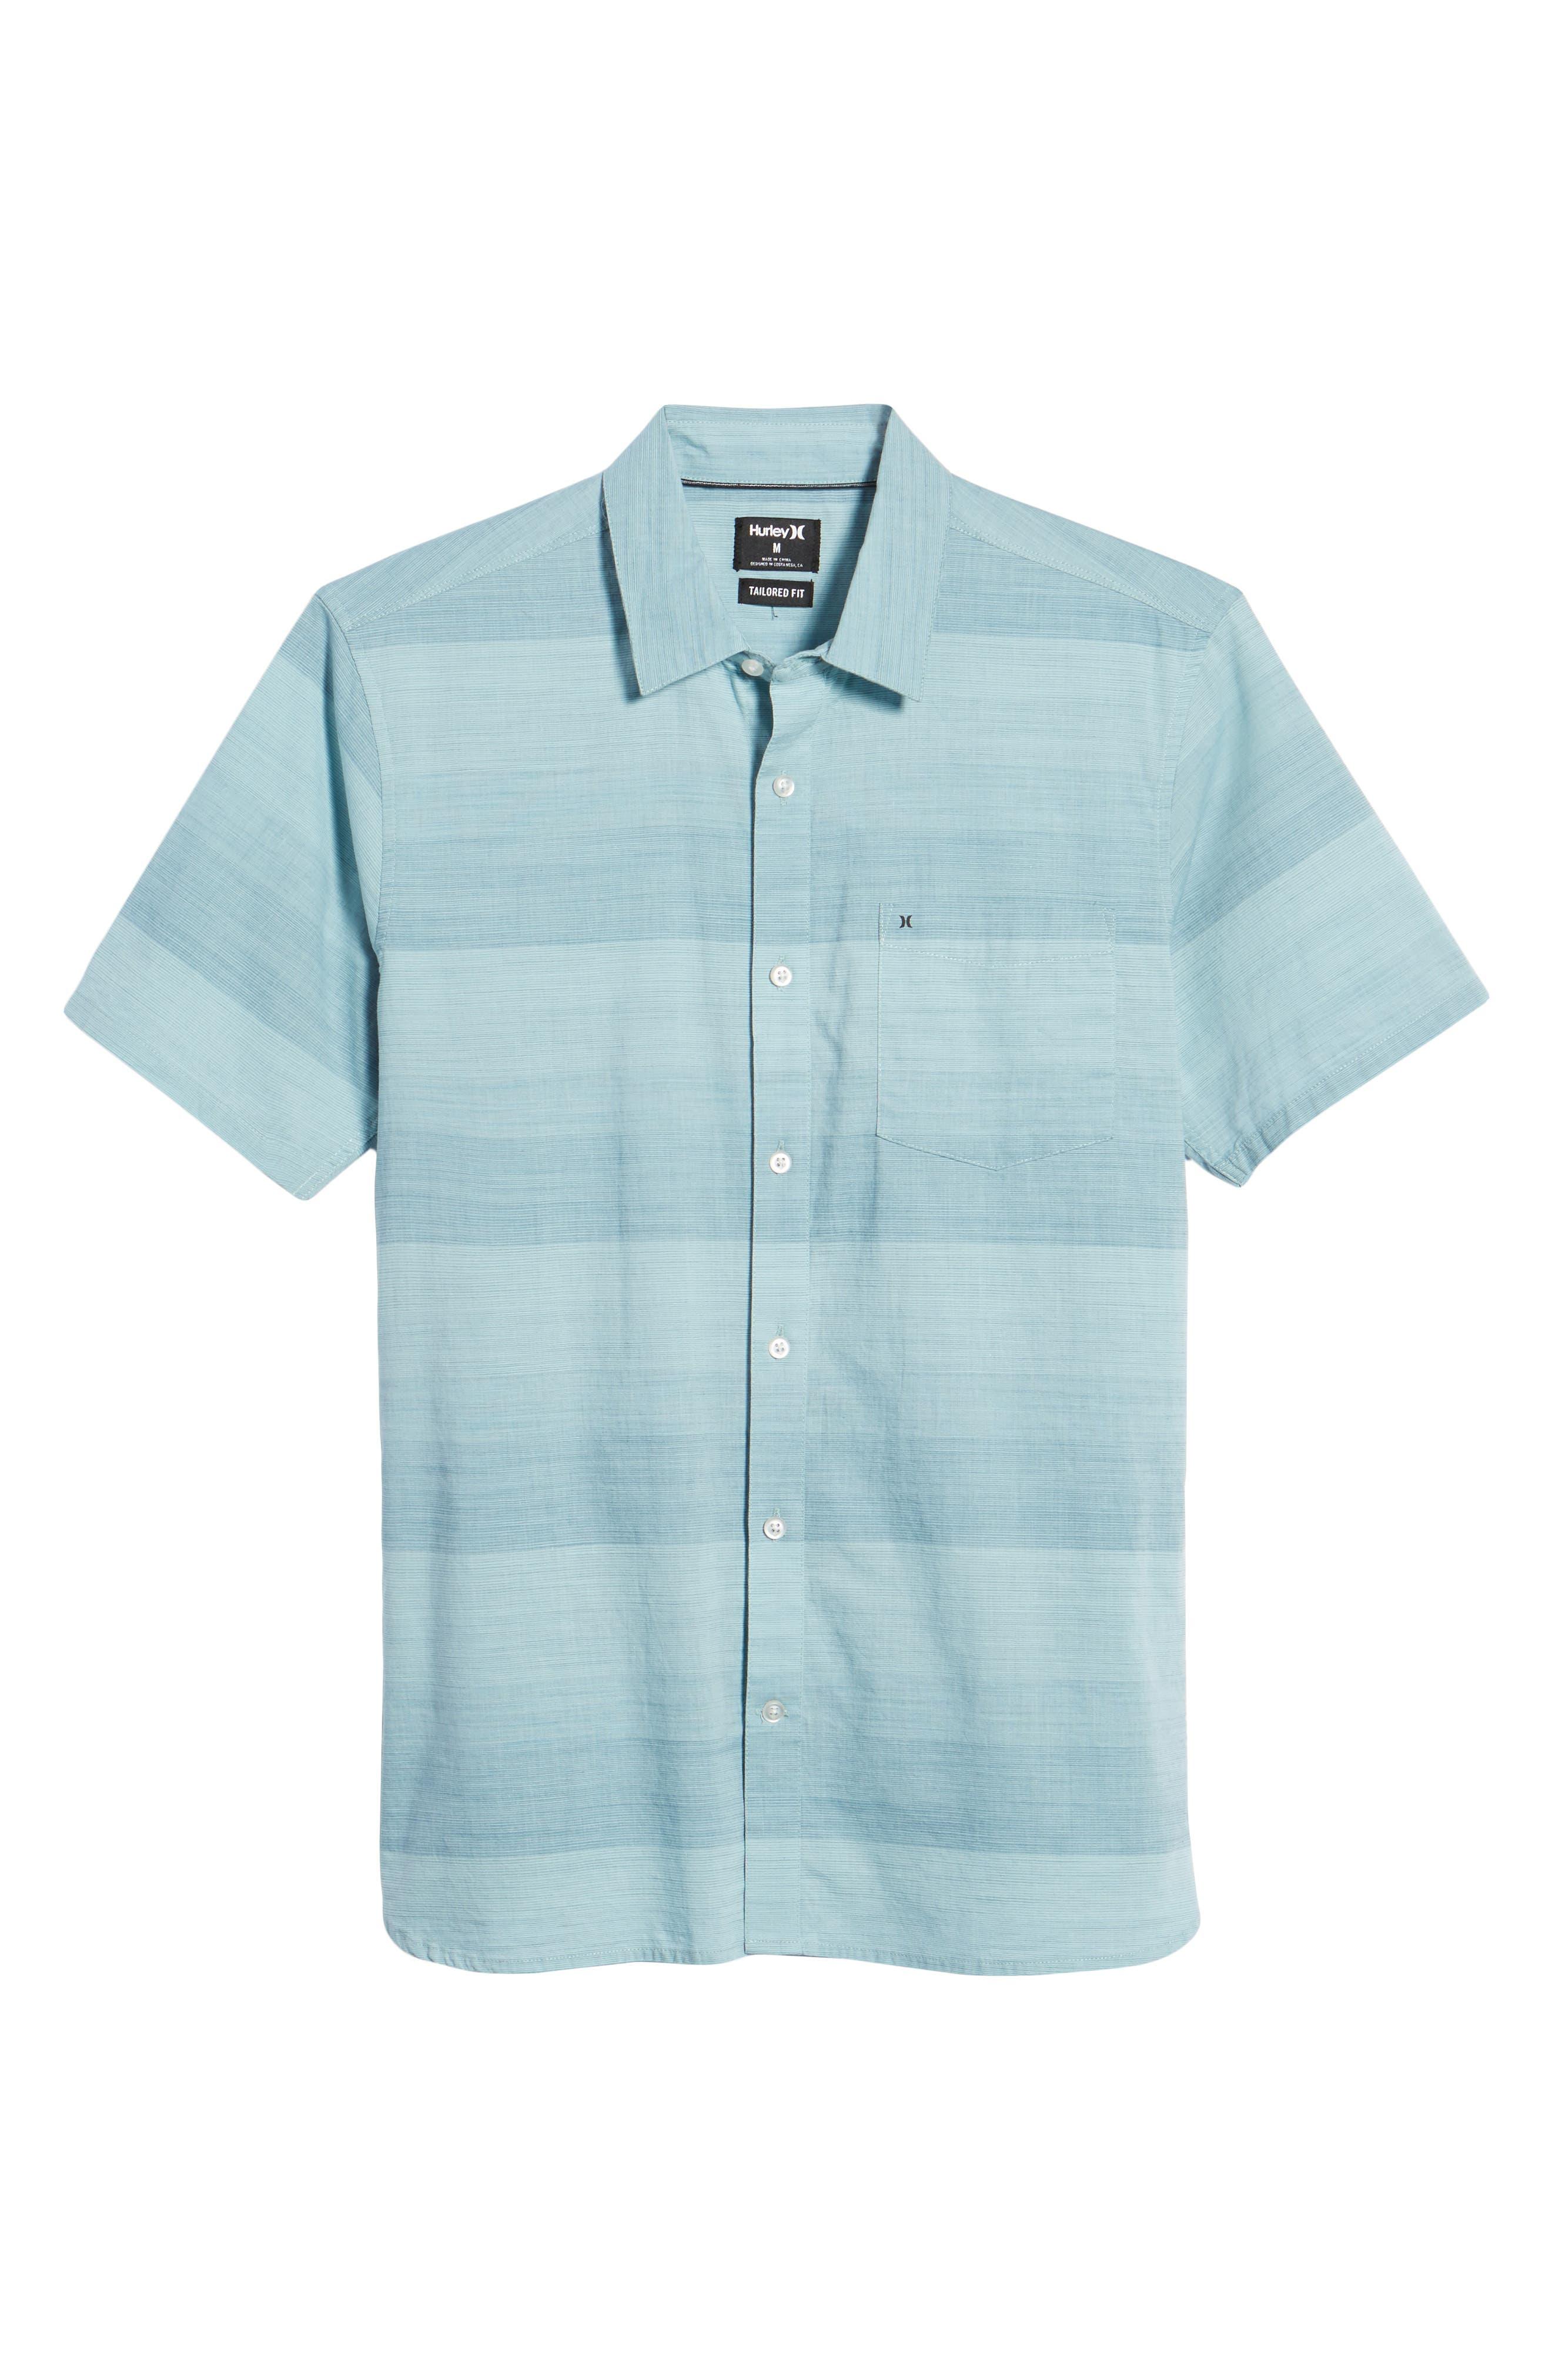 Morris Shirt,                             Alternate thumbnail 6, color,                             NOISE AQUA